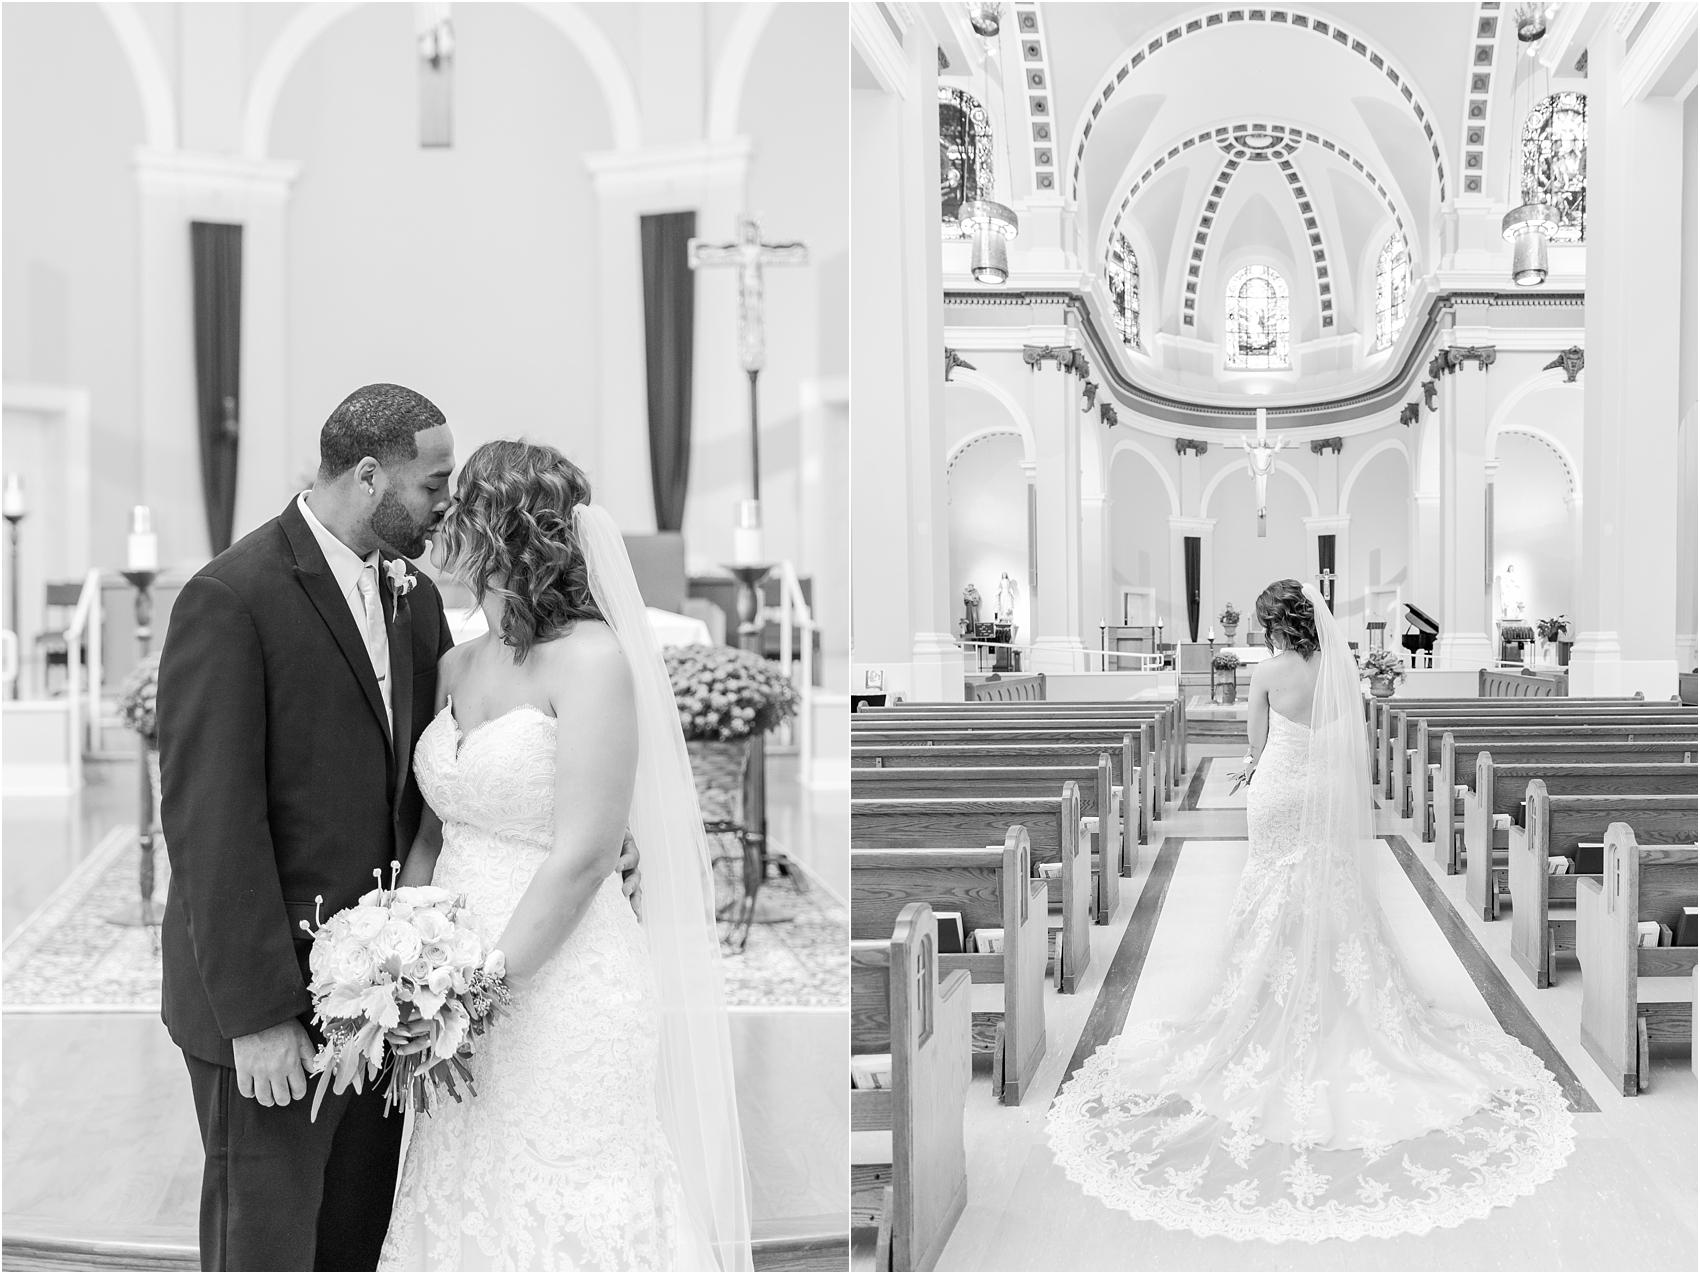 elegant-and-romantic-fall-wedding-photos-at-st-marys-catholic-church-in-monroe-michigan-by-courtney-carolyn-photography_0036.jpg